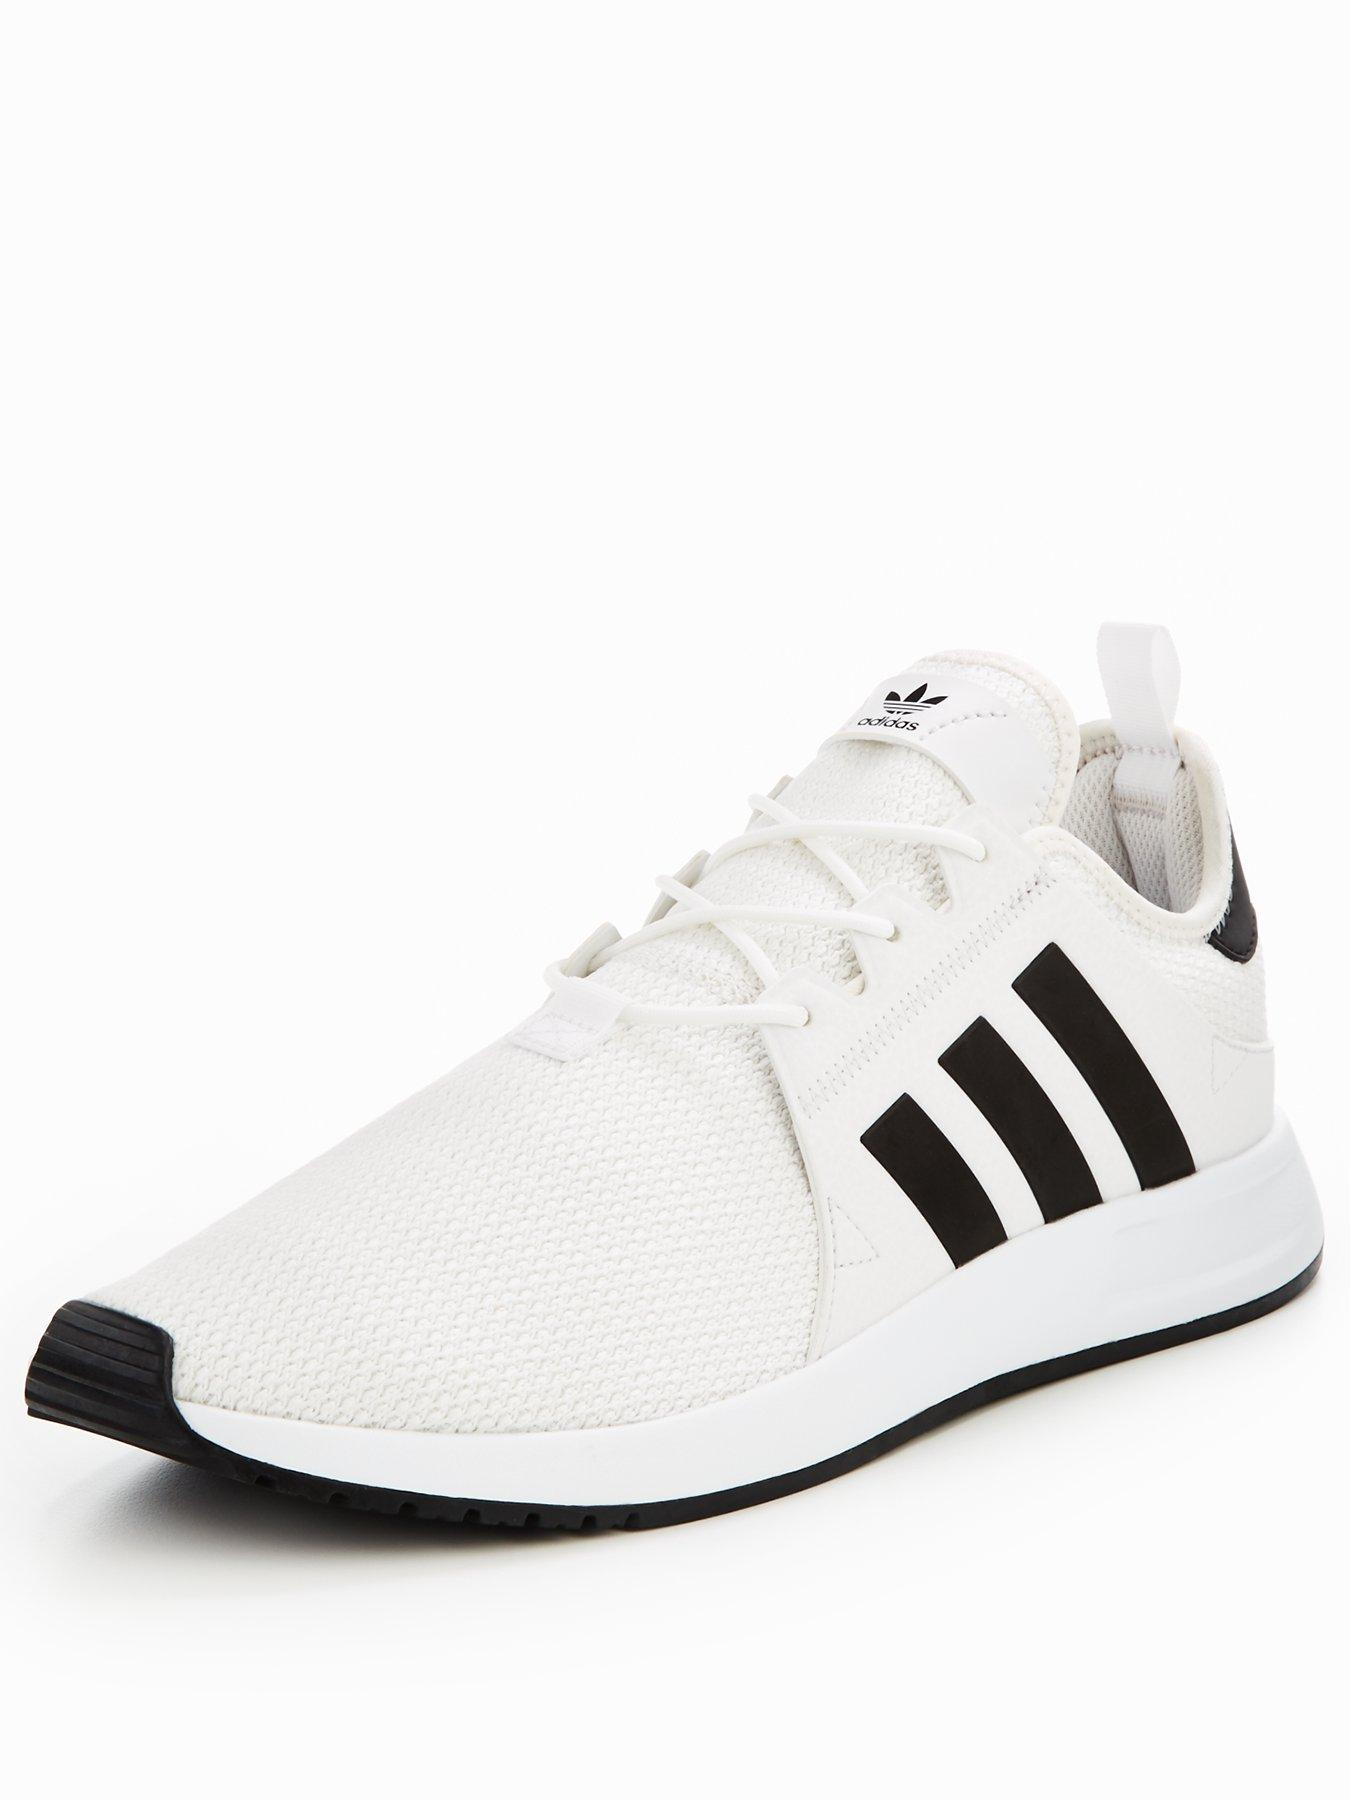 1350x1800 Adidas Originals X Plr Mens Sports Shoes Sports Amp Leisure